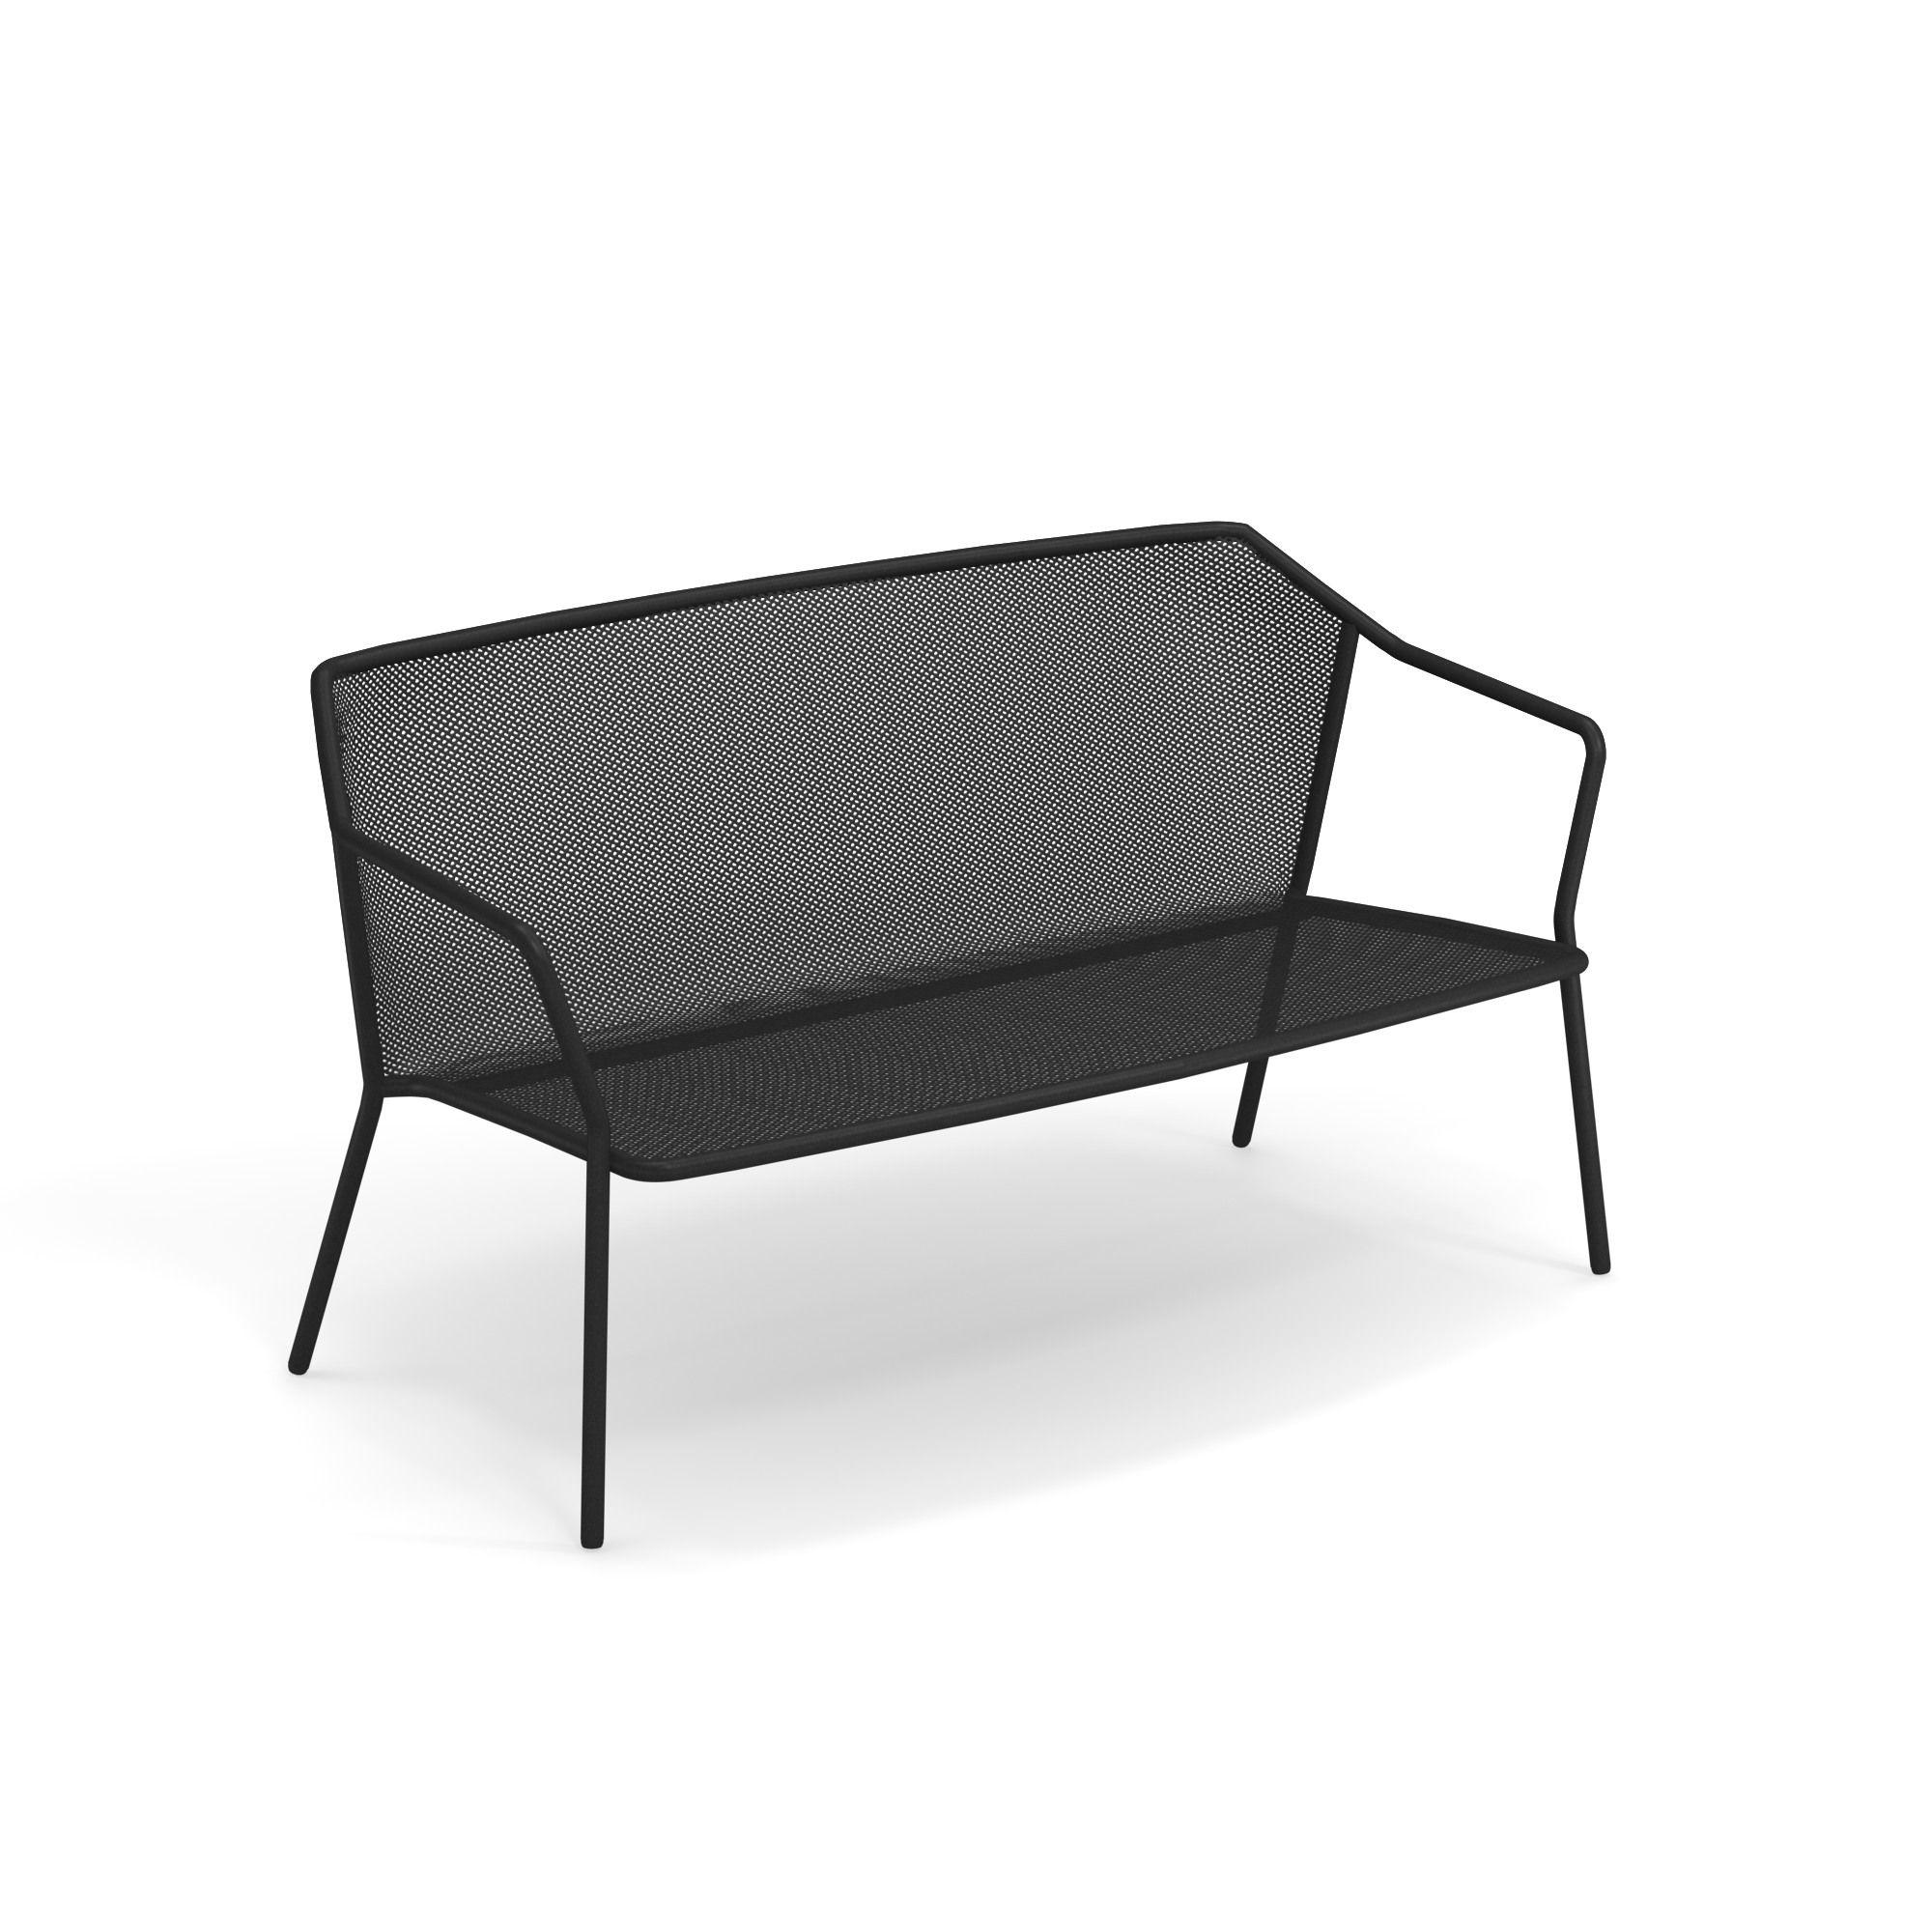 emuamericas, llc 527-24 sofa seating, outdoor